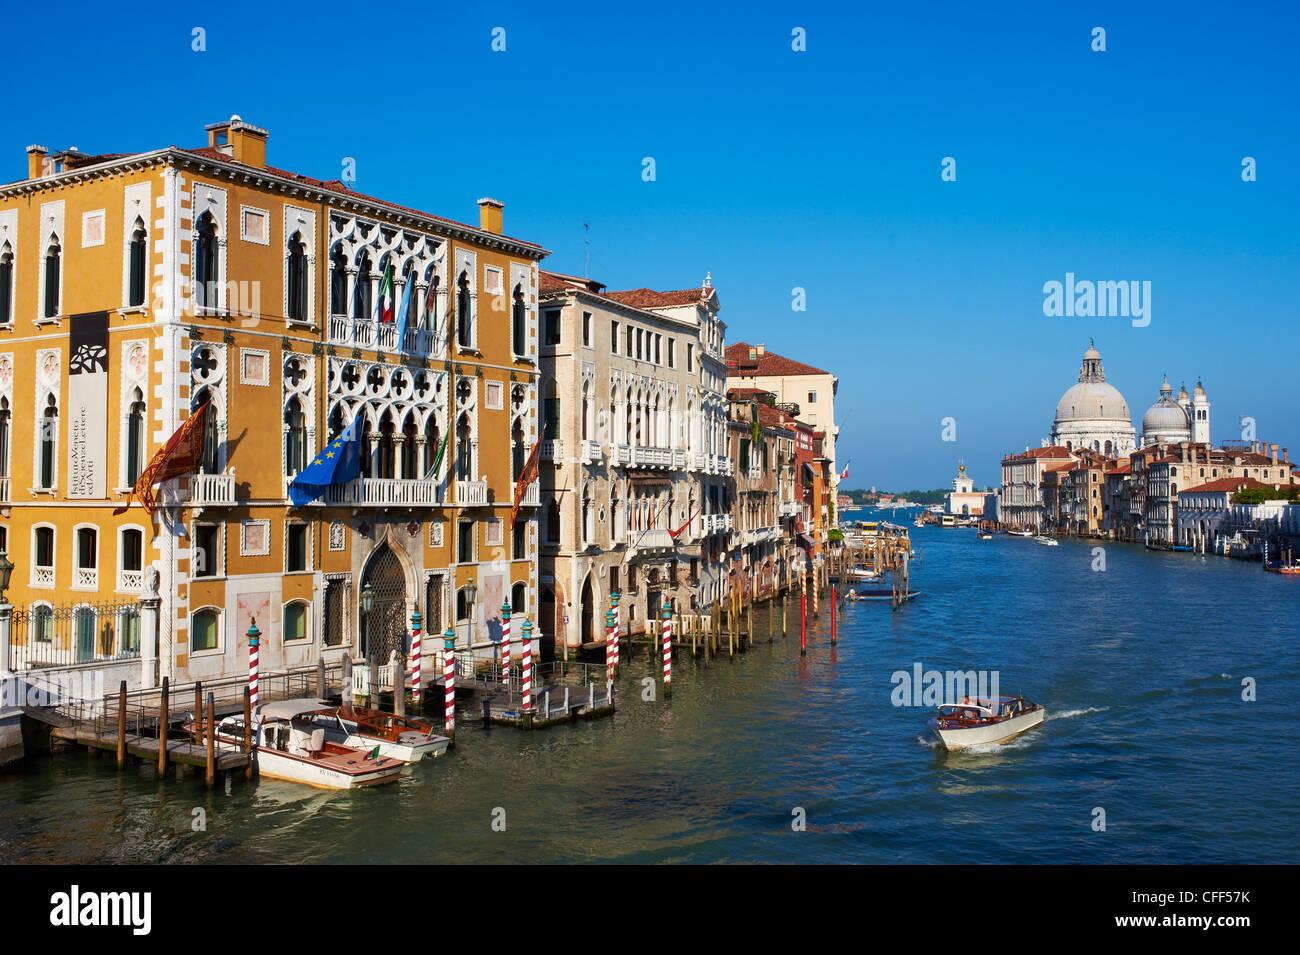 Der Canal Grande und die Kirche Santa Maria della Salute in der Ferne, Venedig, Veneto, Italien Stockbild